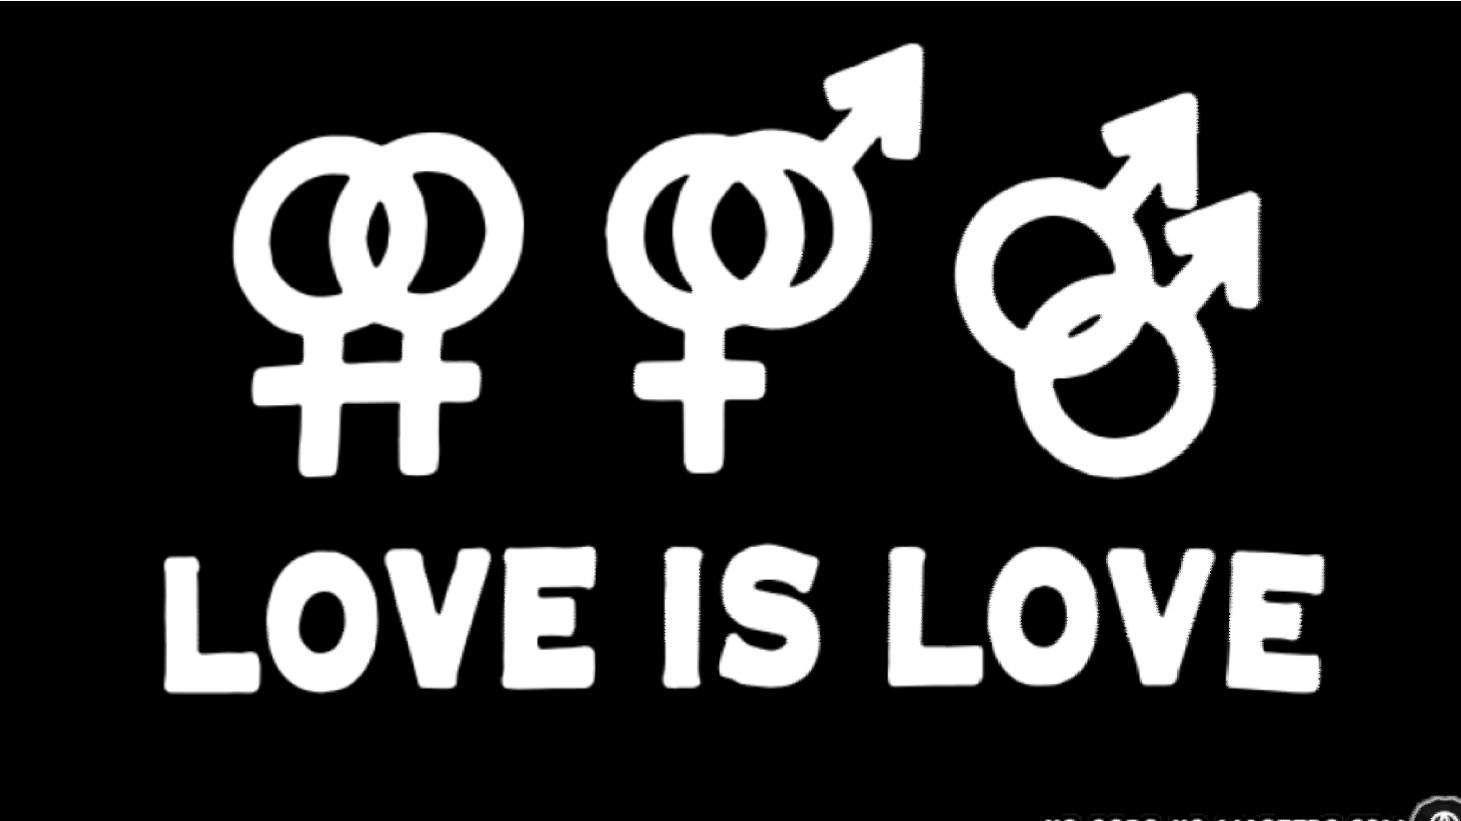 Halifax 45+ LGBTQ Commingle group